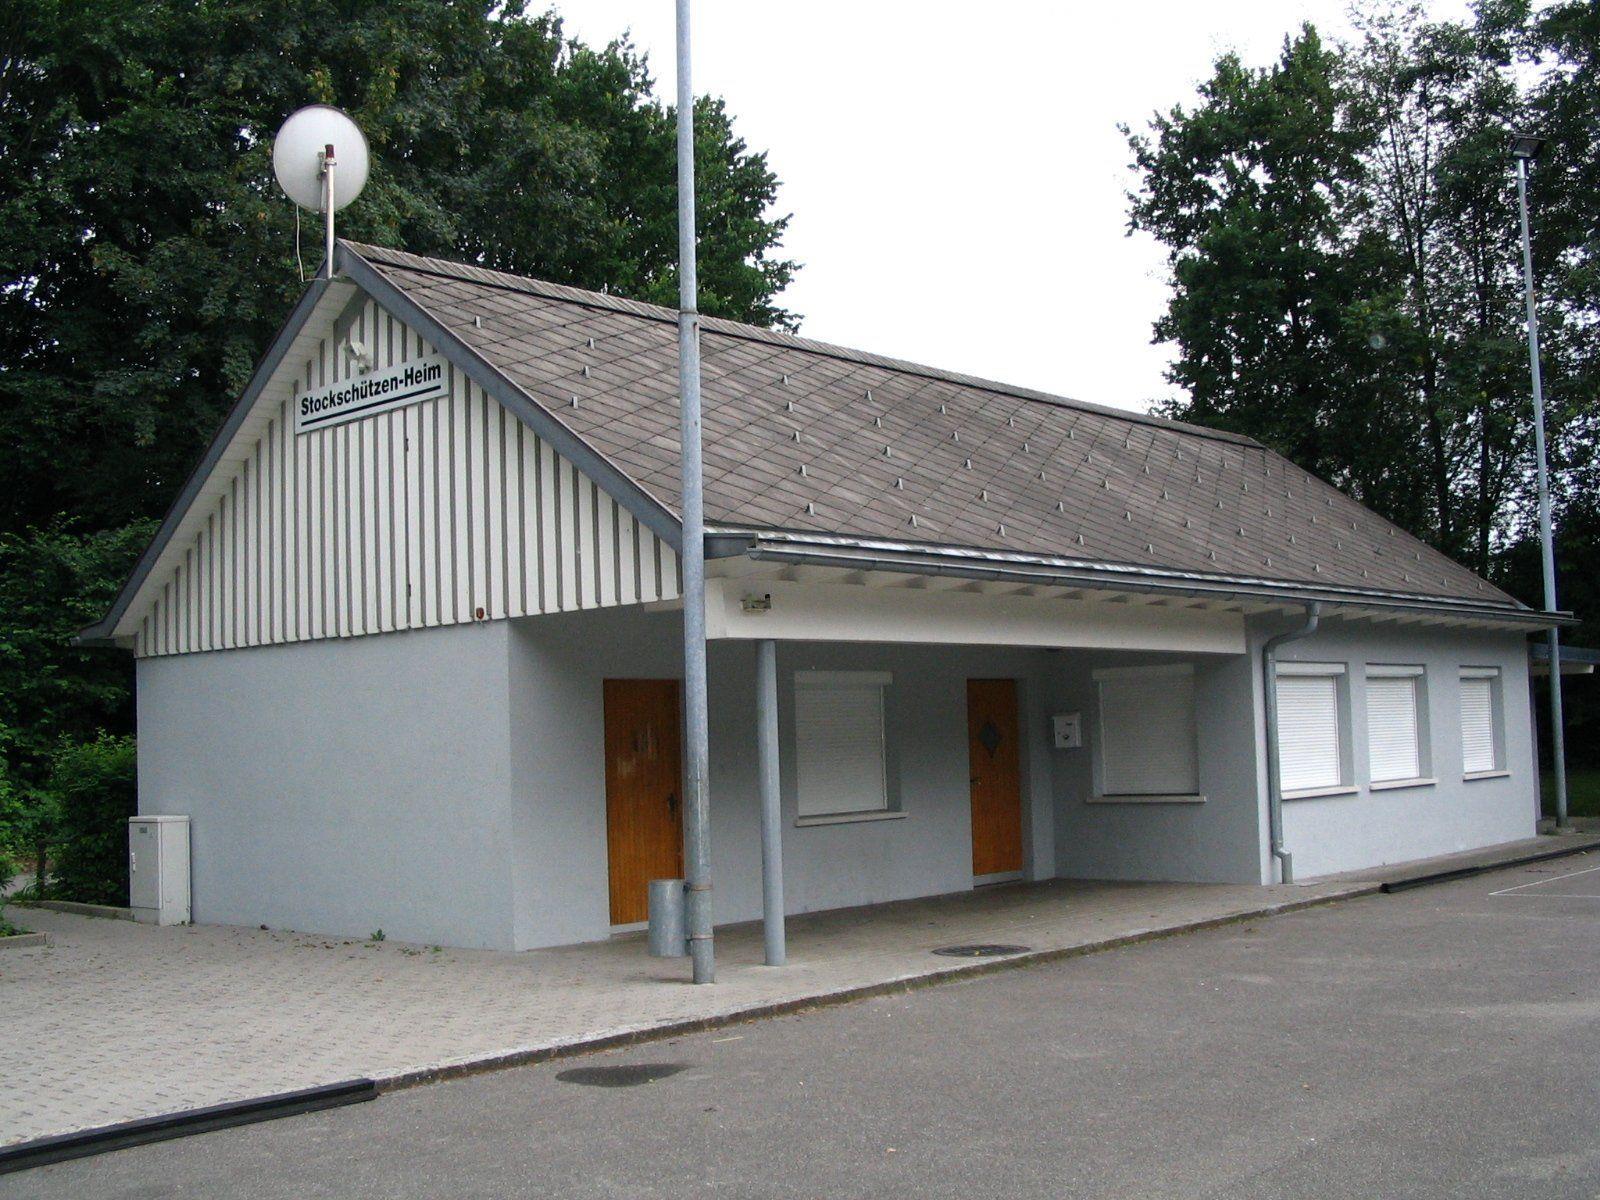 30 Jahre Stocksportklub Mäder.